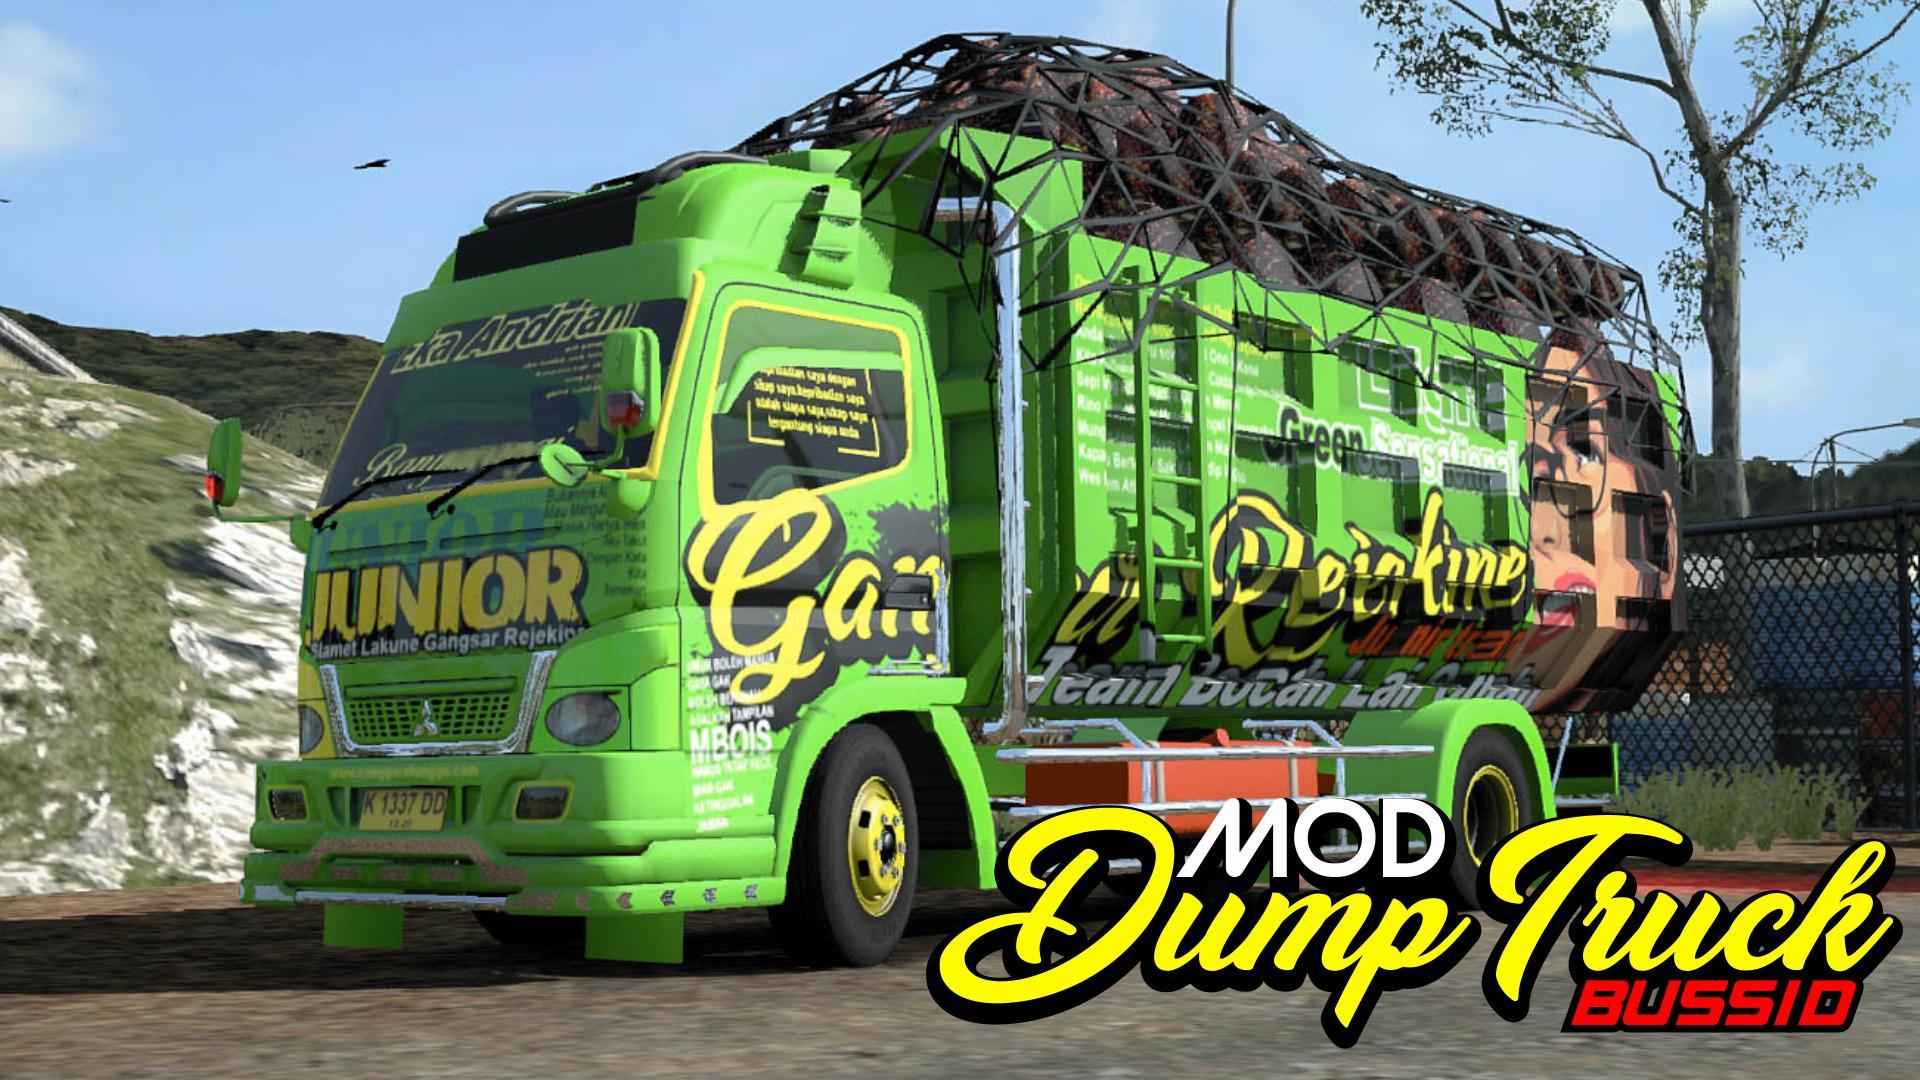 Gambar Modifikasi Truk Dump Truck Mod Dump Truck Bussid For Android Apk Download